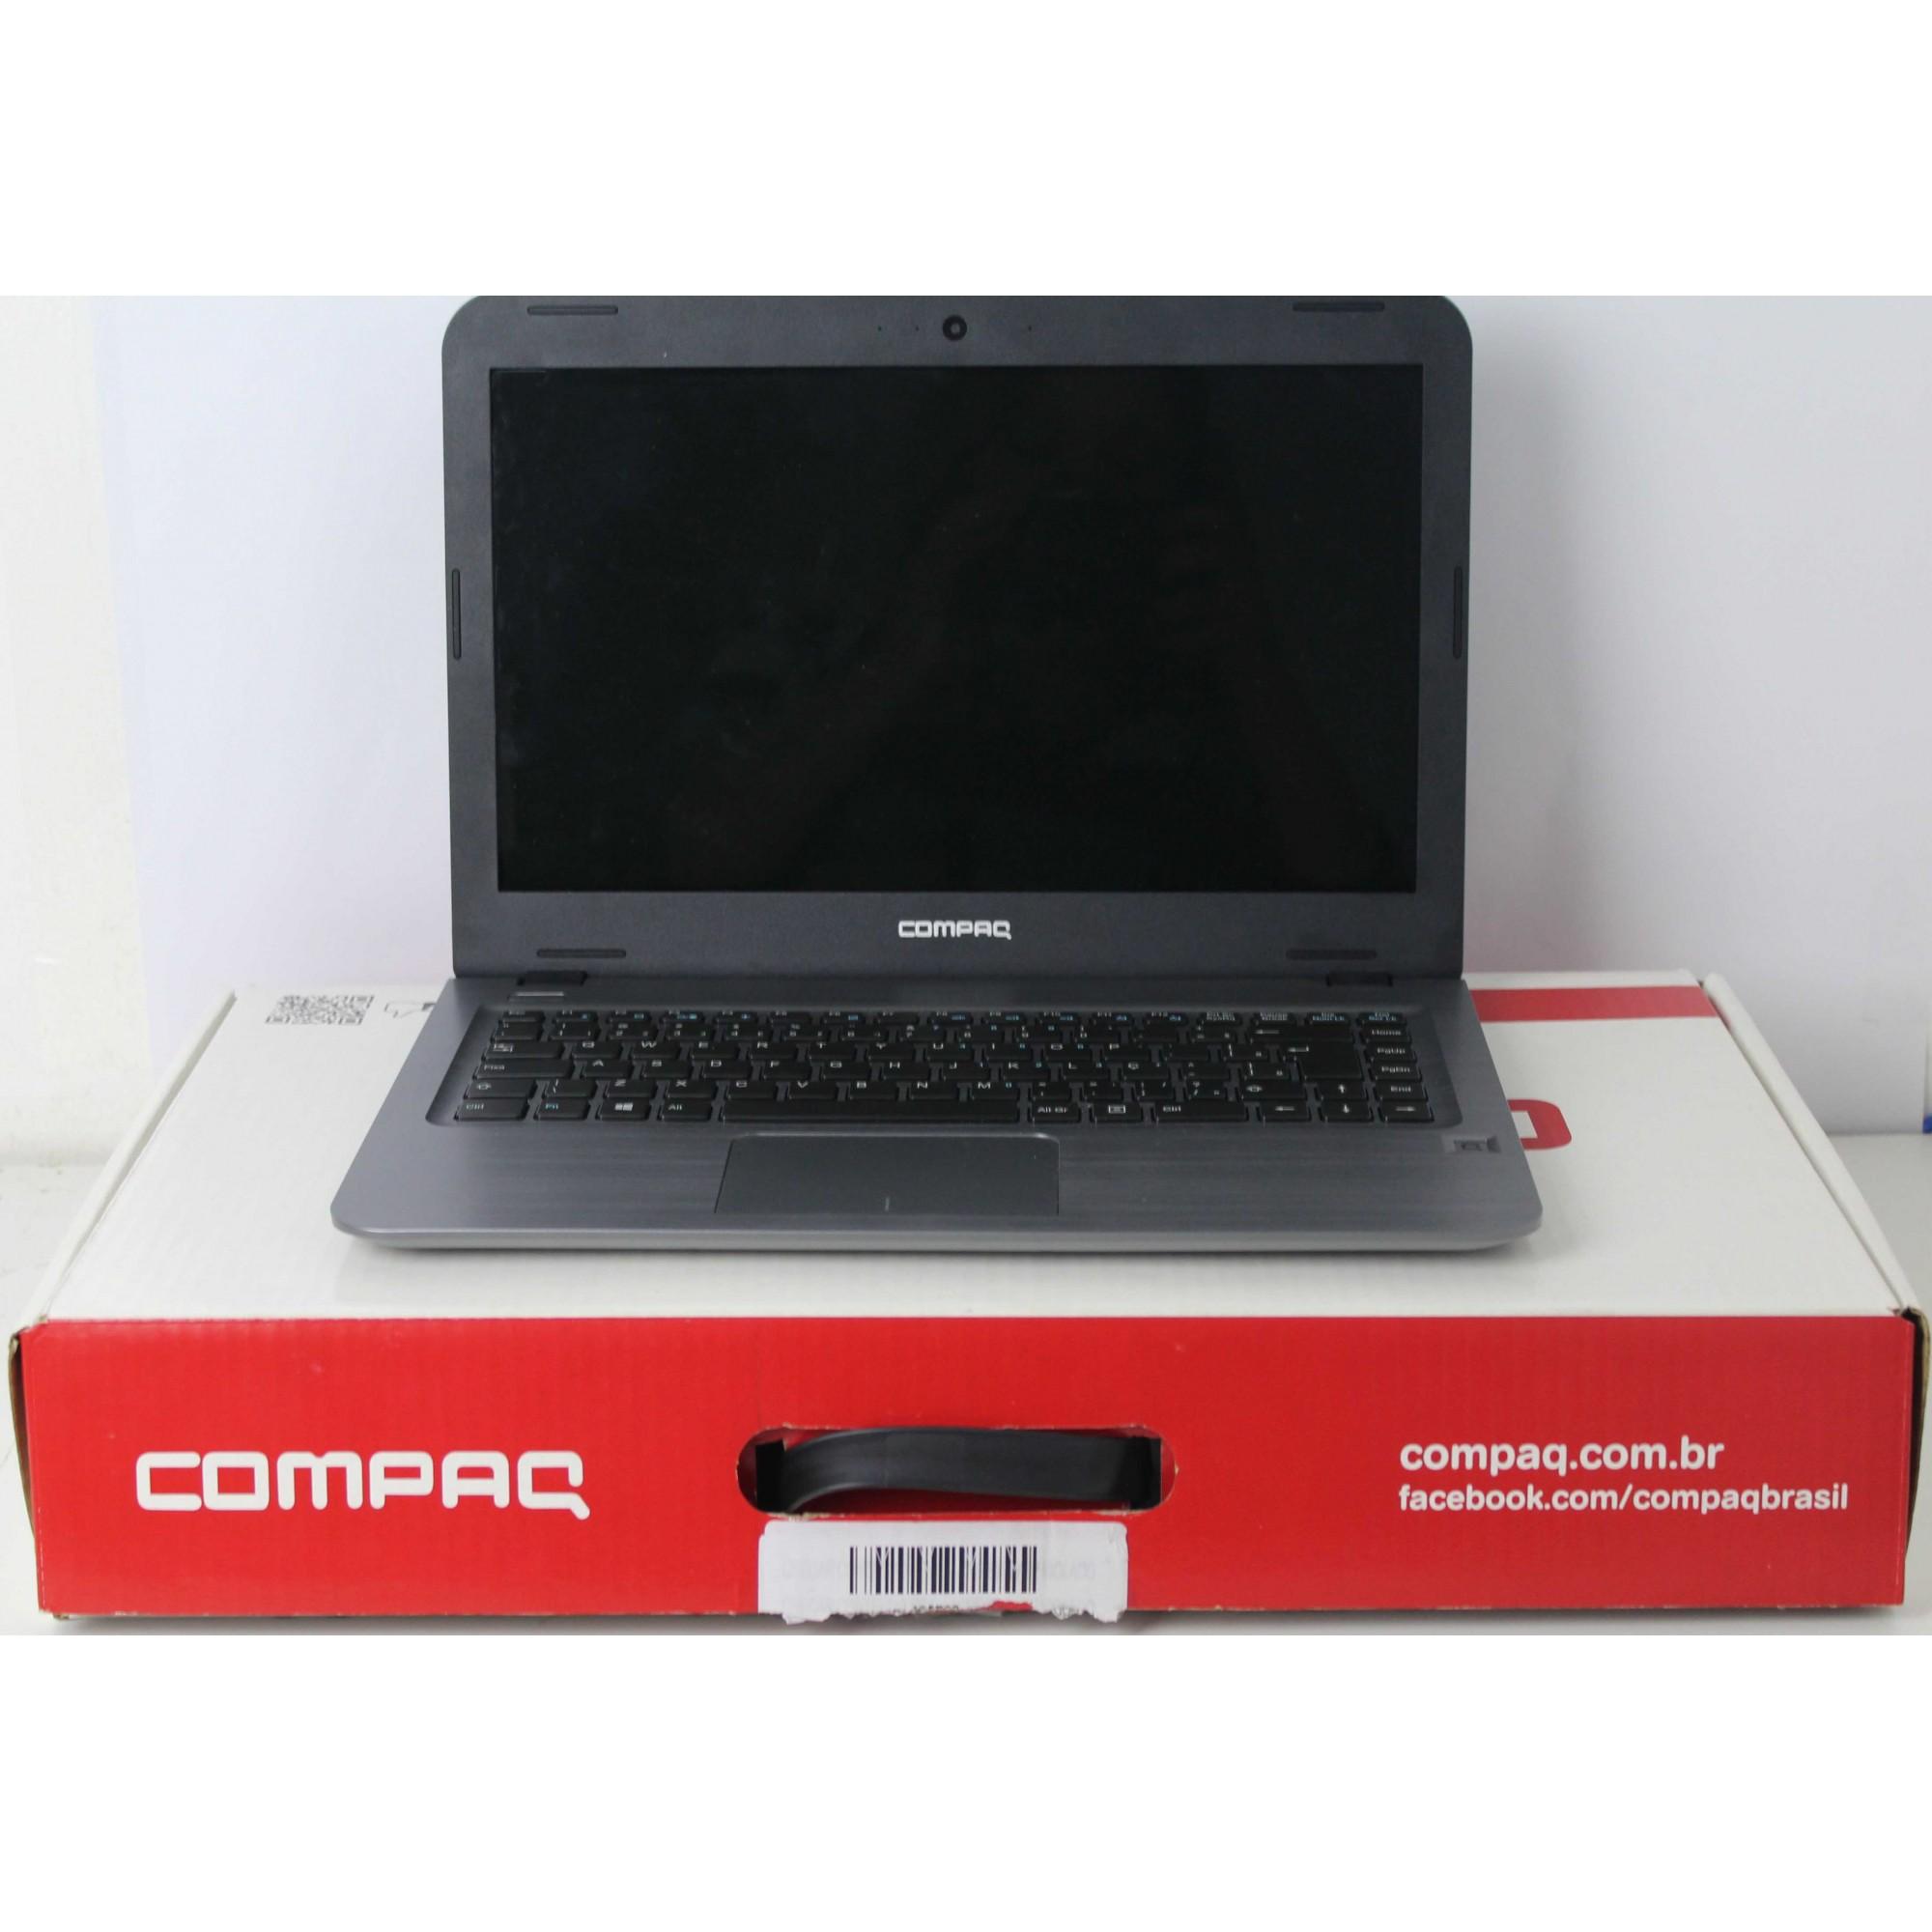 Notebook Compaq Presario CQ15 14'' Intel Celeron 1.1GHz 4GB HD-500GB